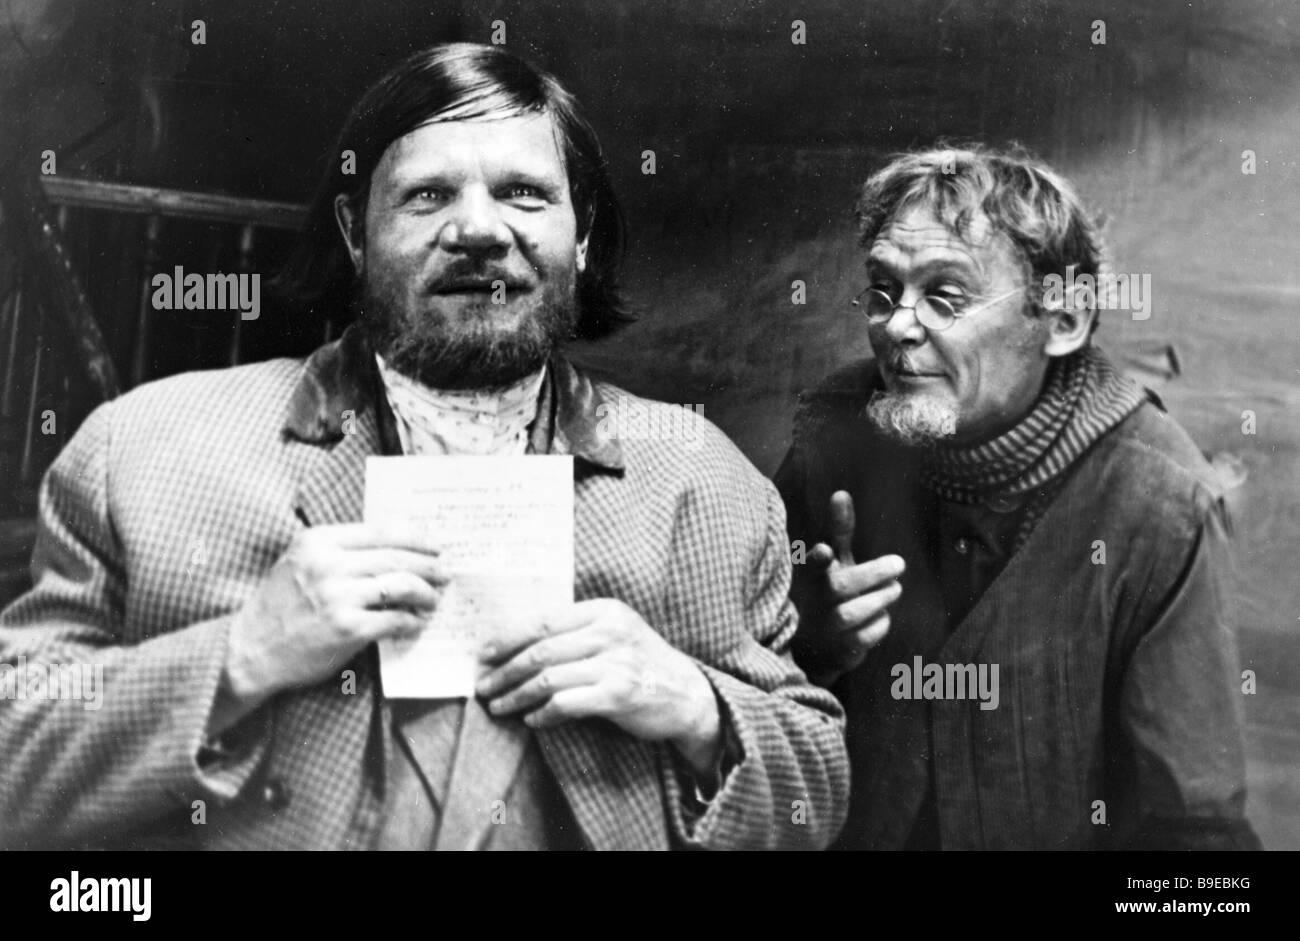 Mikhail Pugovkin Left And Leonid Gaidai In The Film Twelve Chairs Filmed At  The Mosfilm Film Studio By Leonid Gaidai